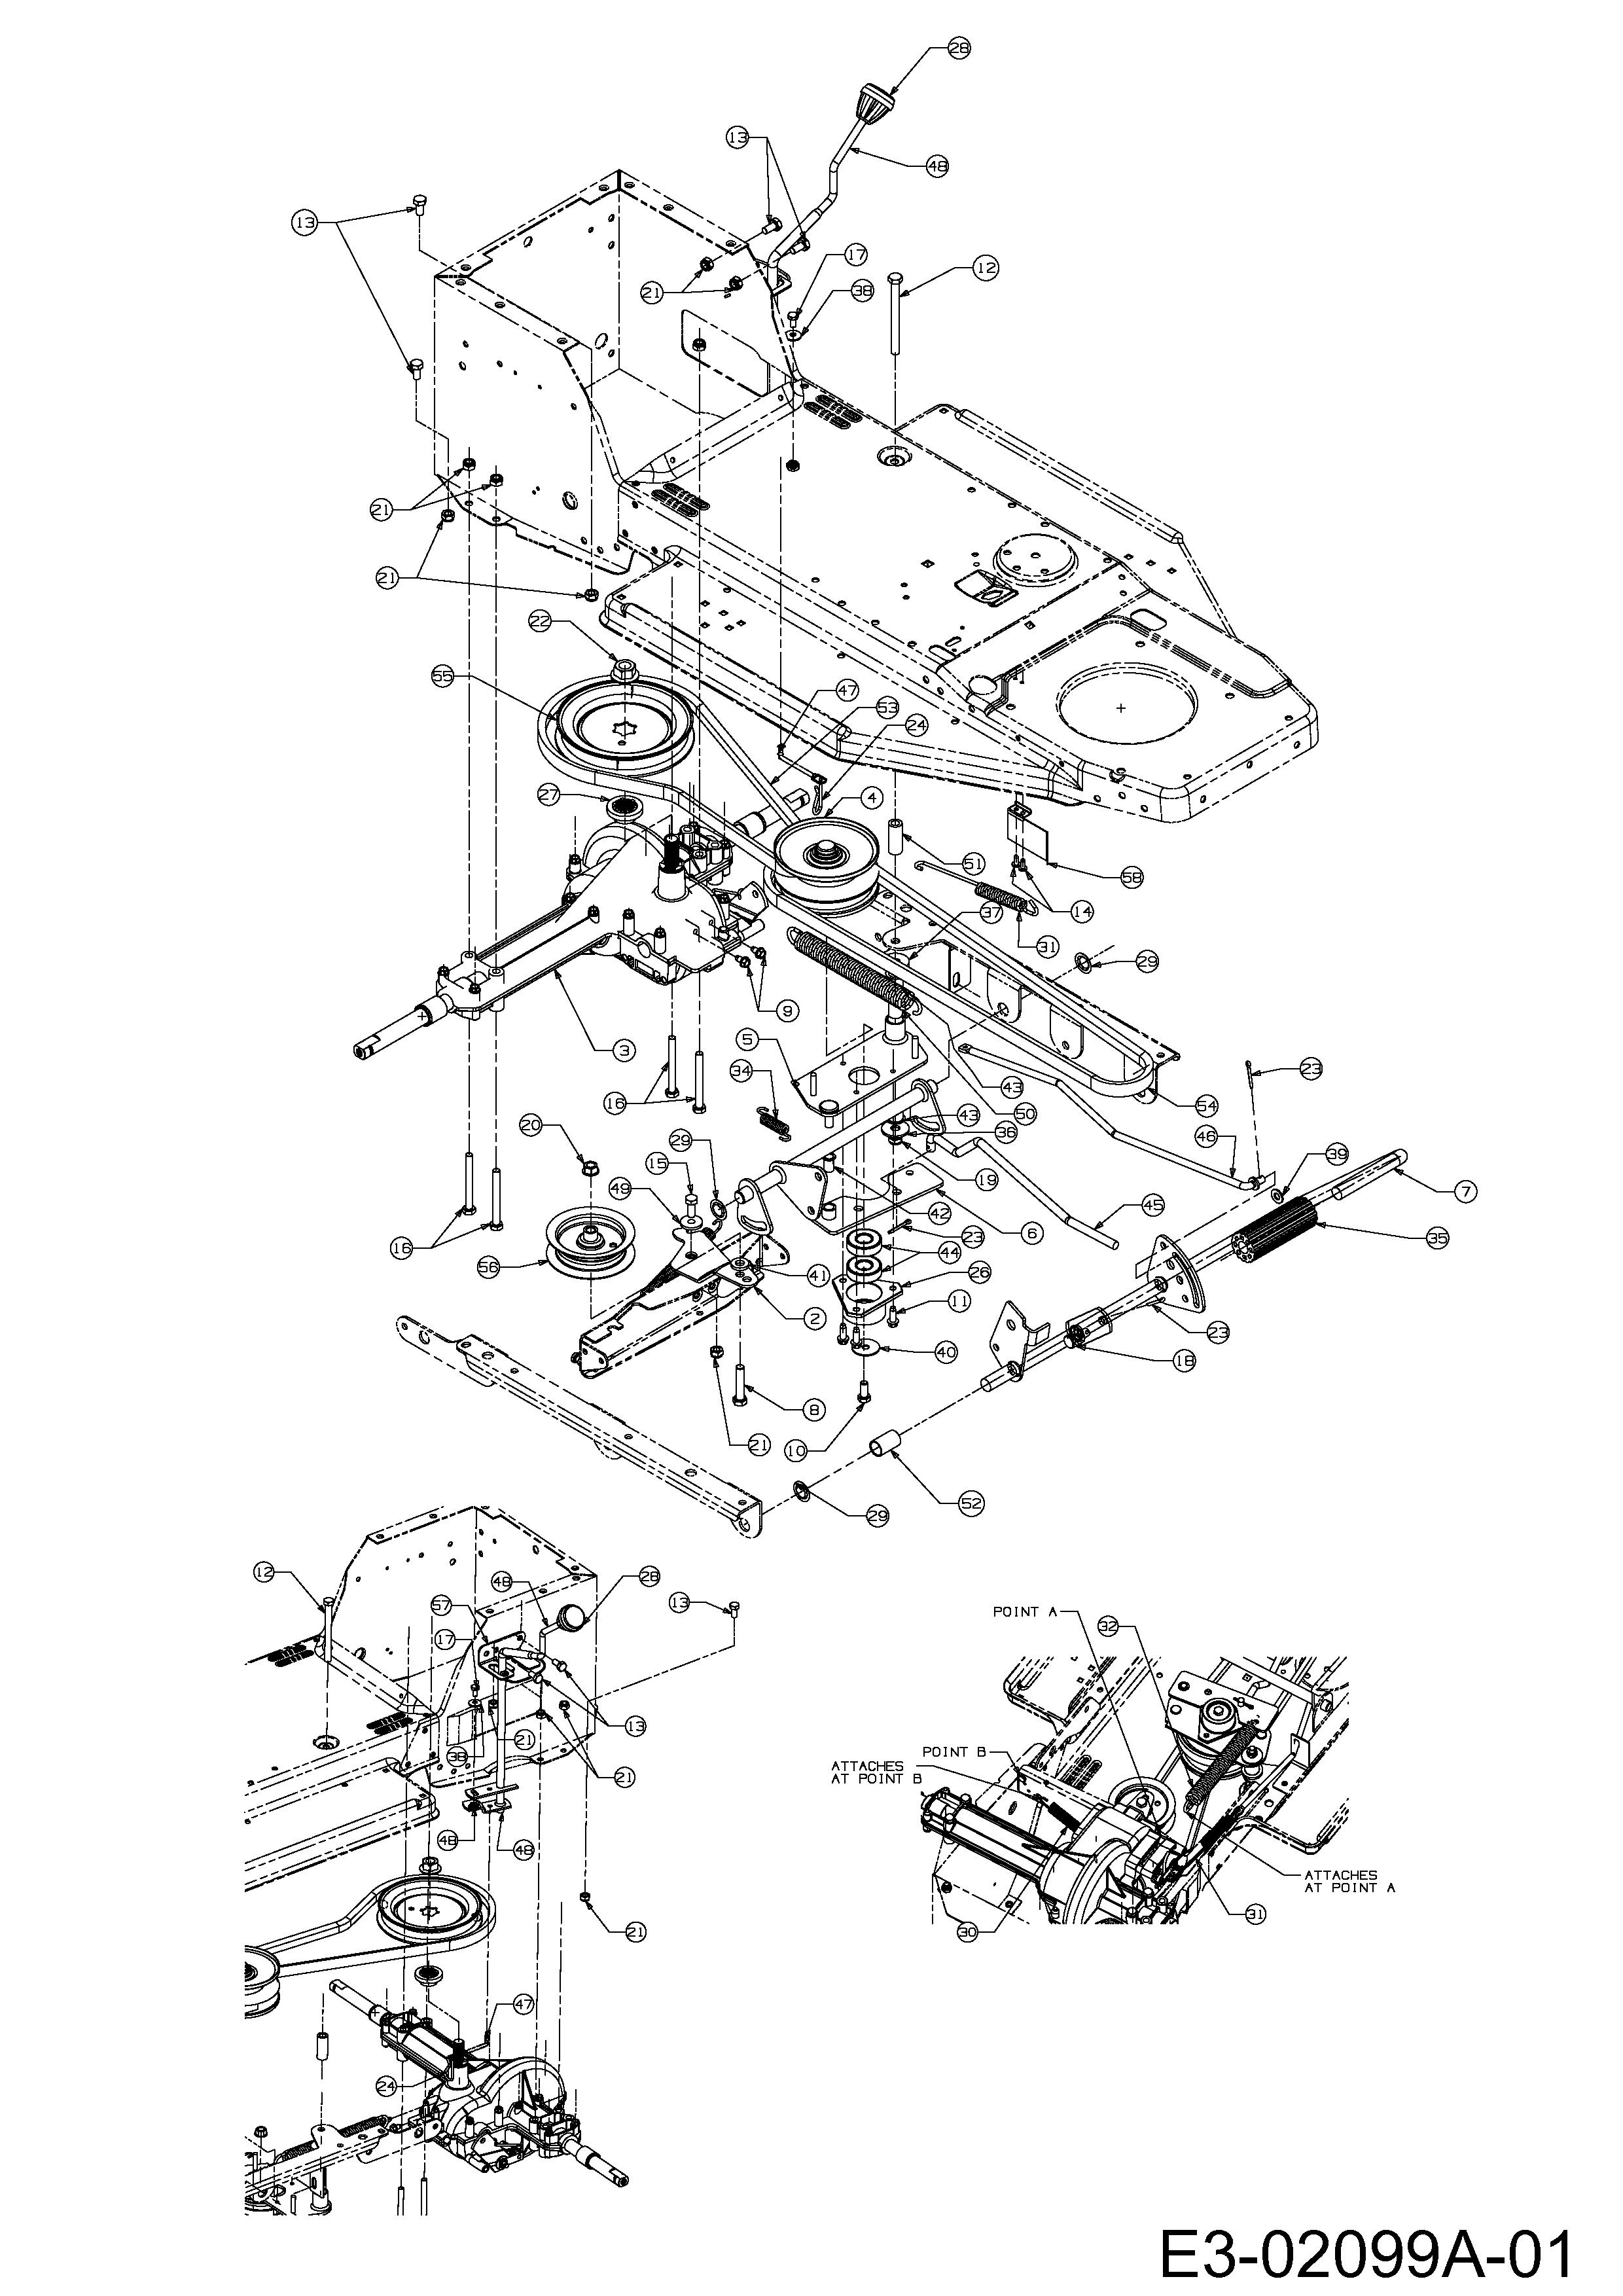 Keilriemen Fahrantrieb am Motor passend MTD B 135 13BA668F678 Rasentraktor